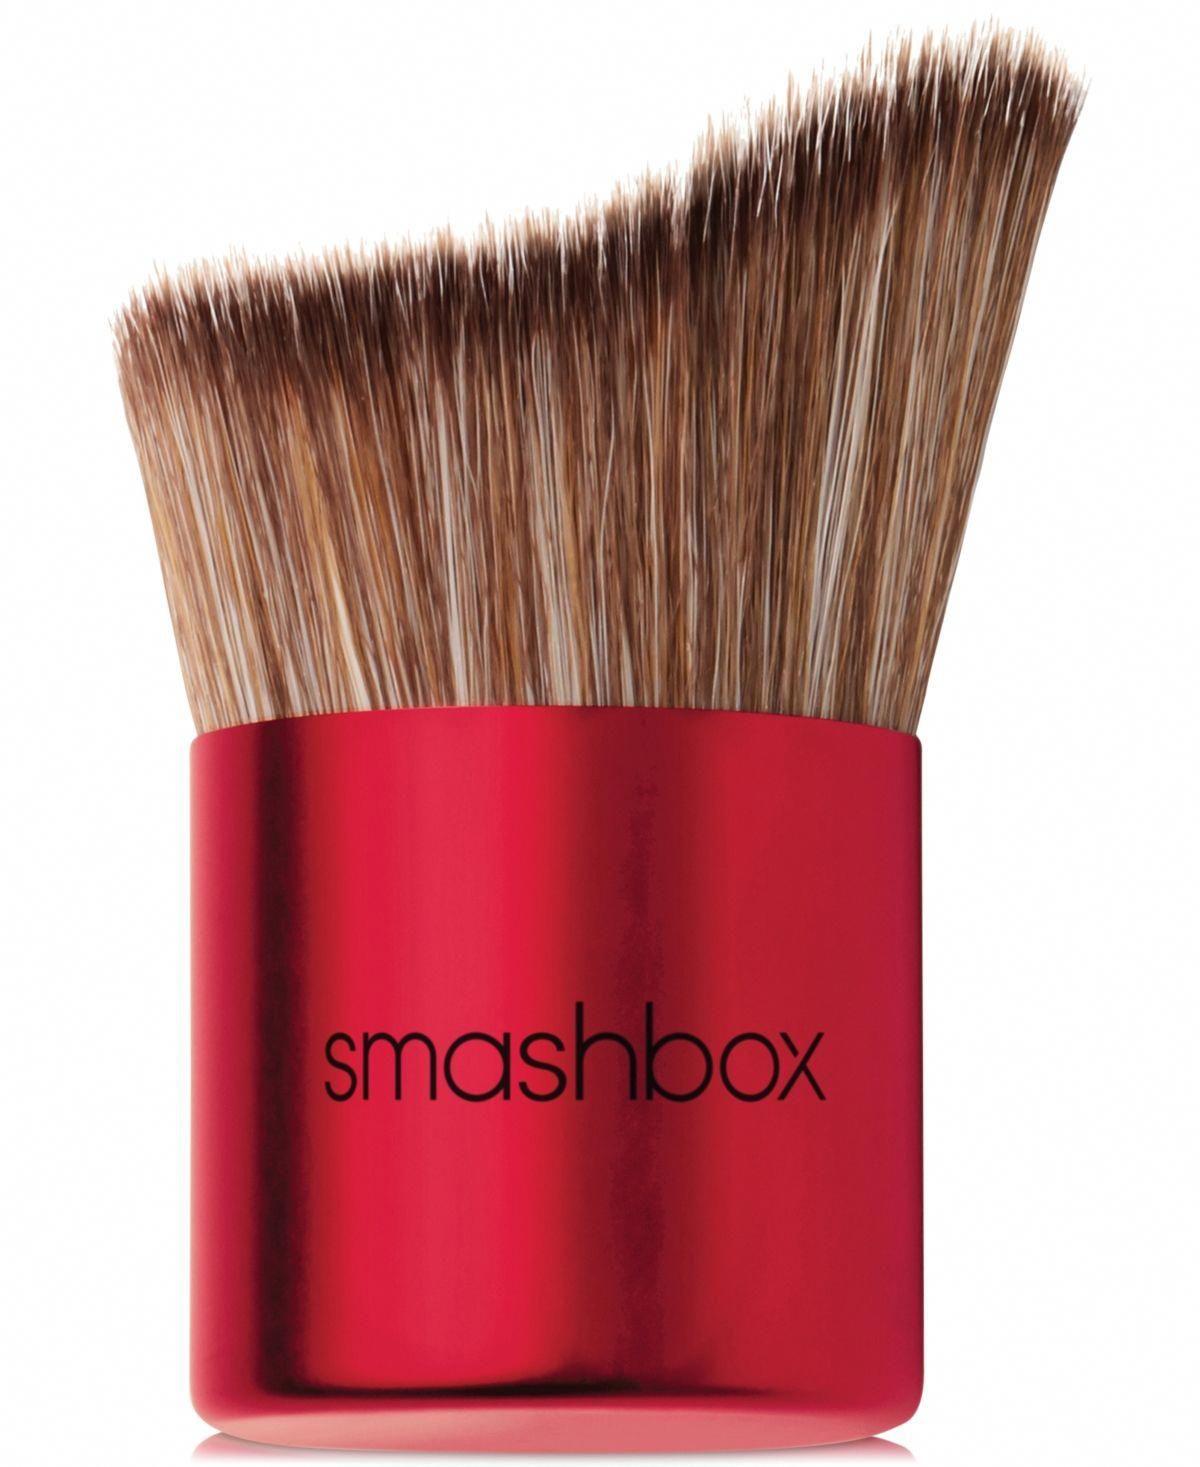 Smashbox Sculpting Buki Brush womensfashionover50older in